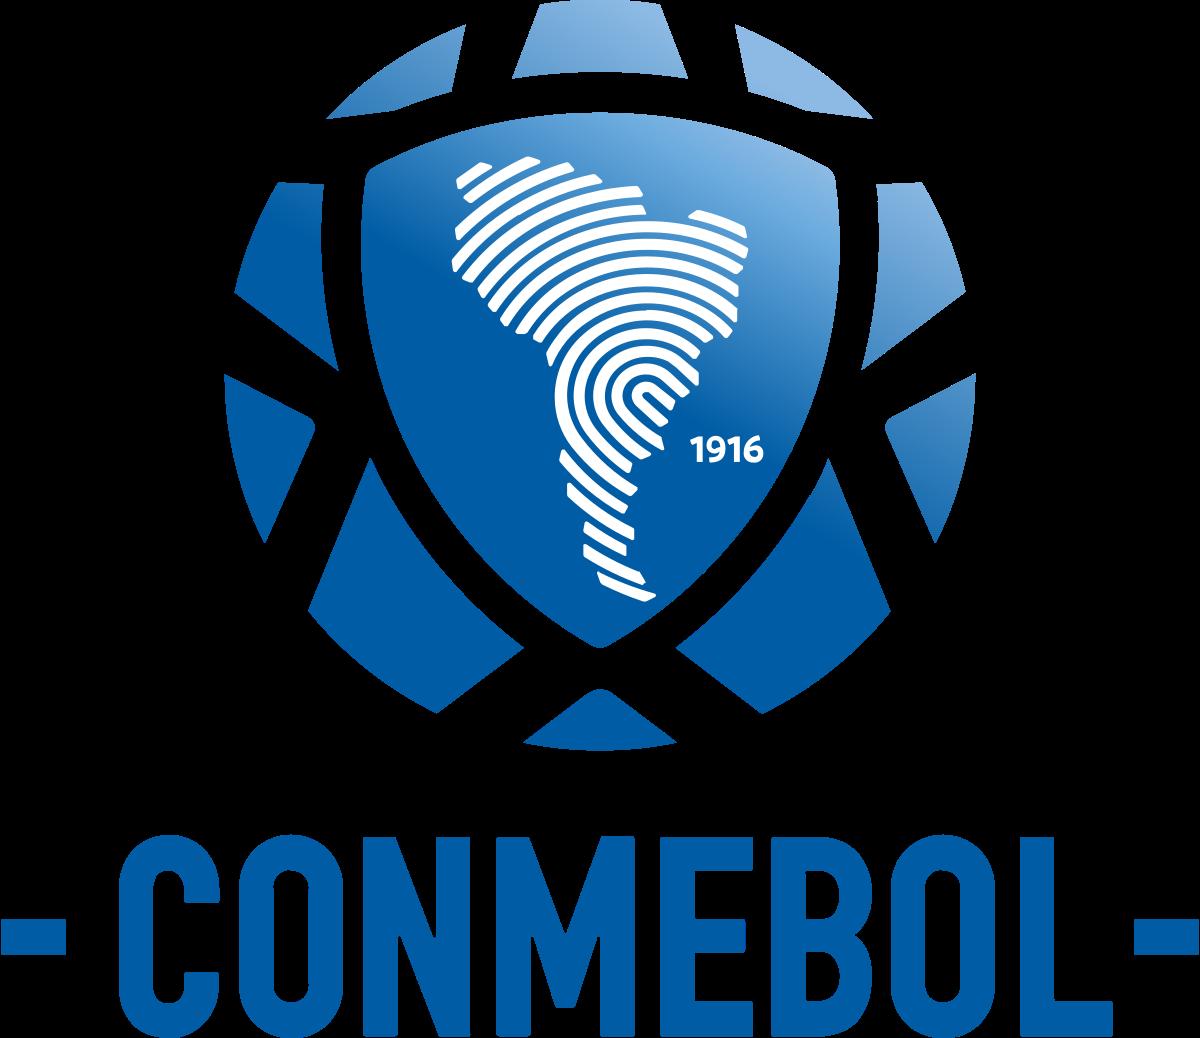 Confederation Sud Americaine De Football Wikipedia